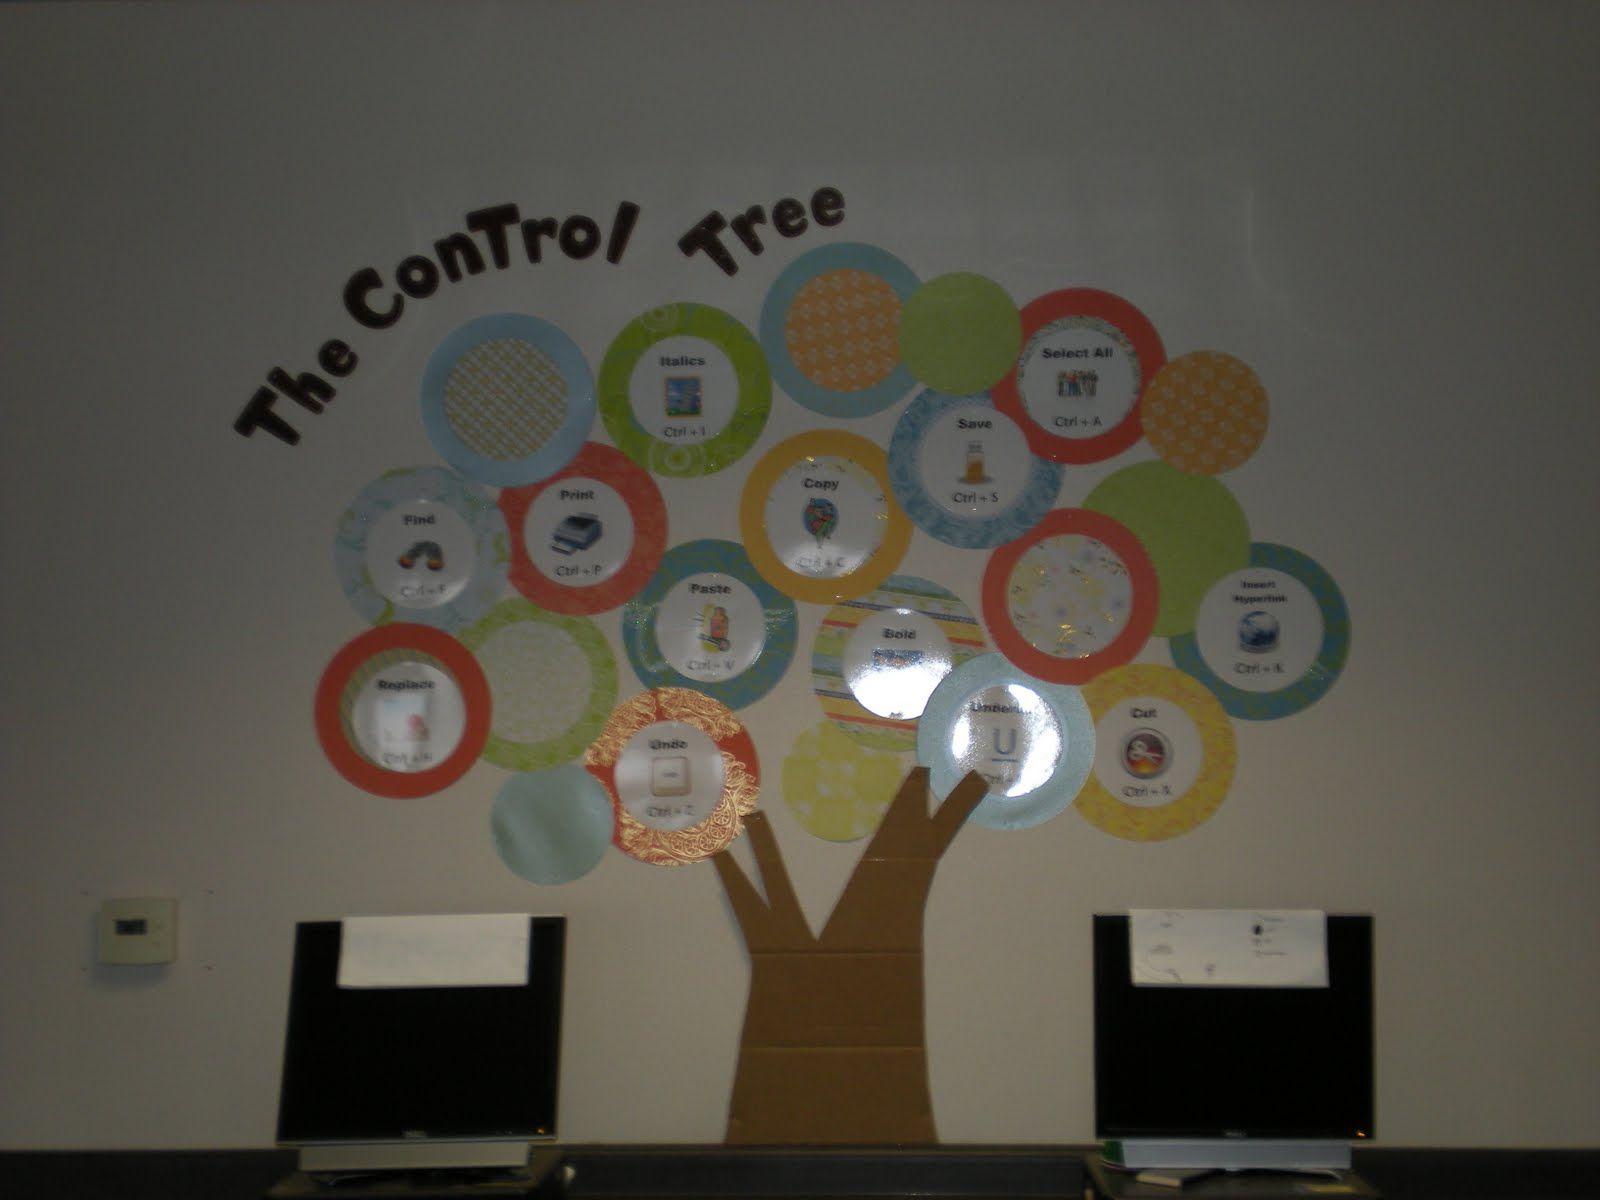 Computer Lab Bulletin Board The Control Tree Shortcuts